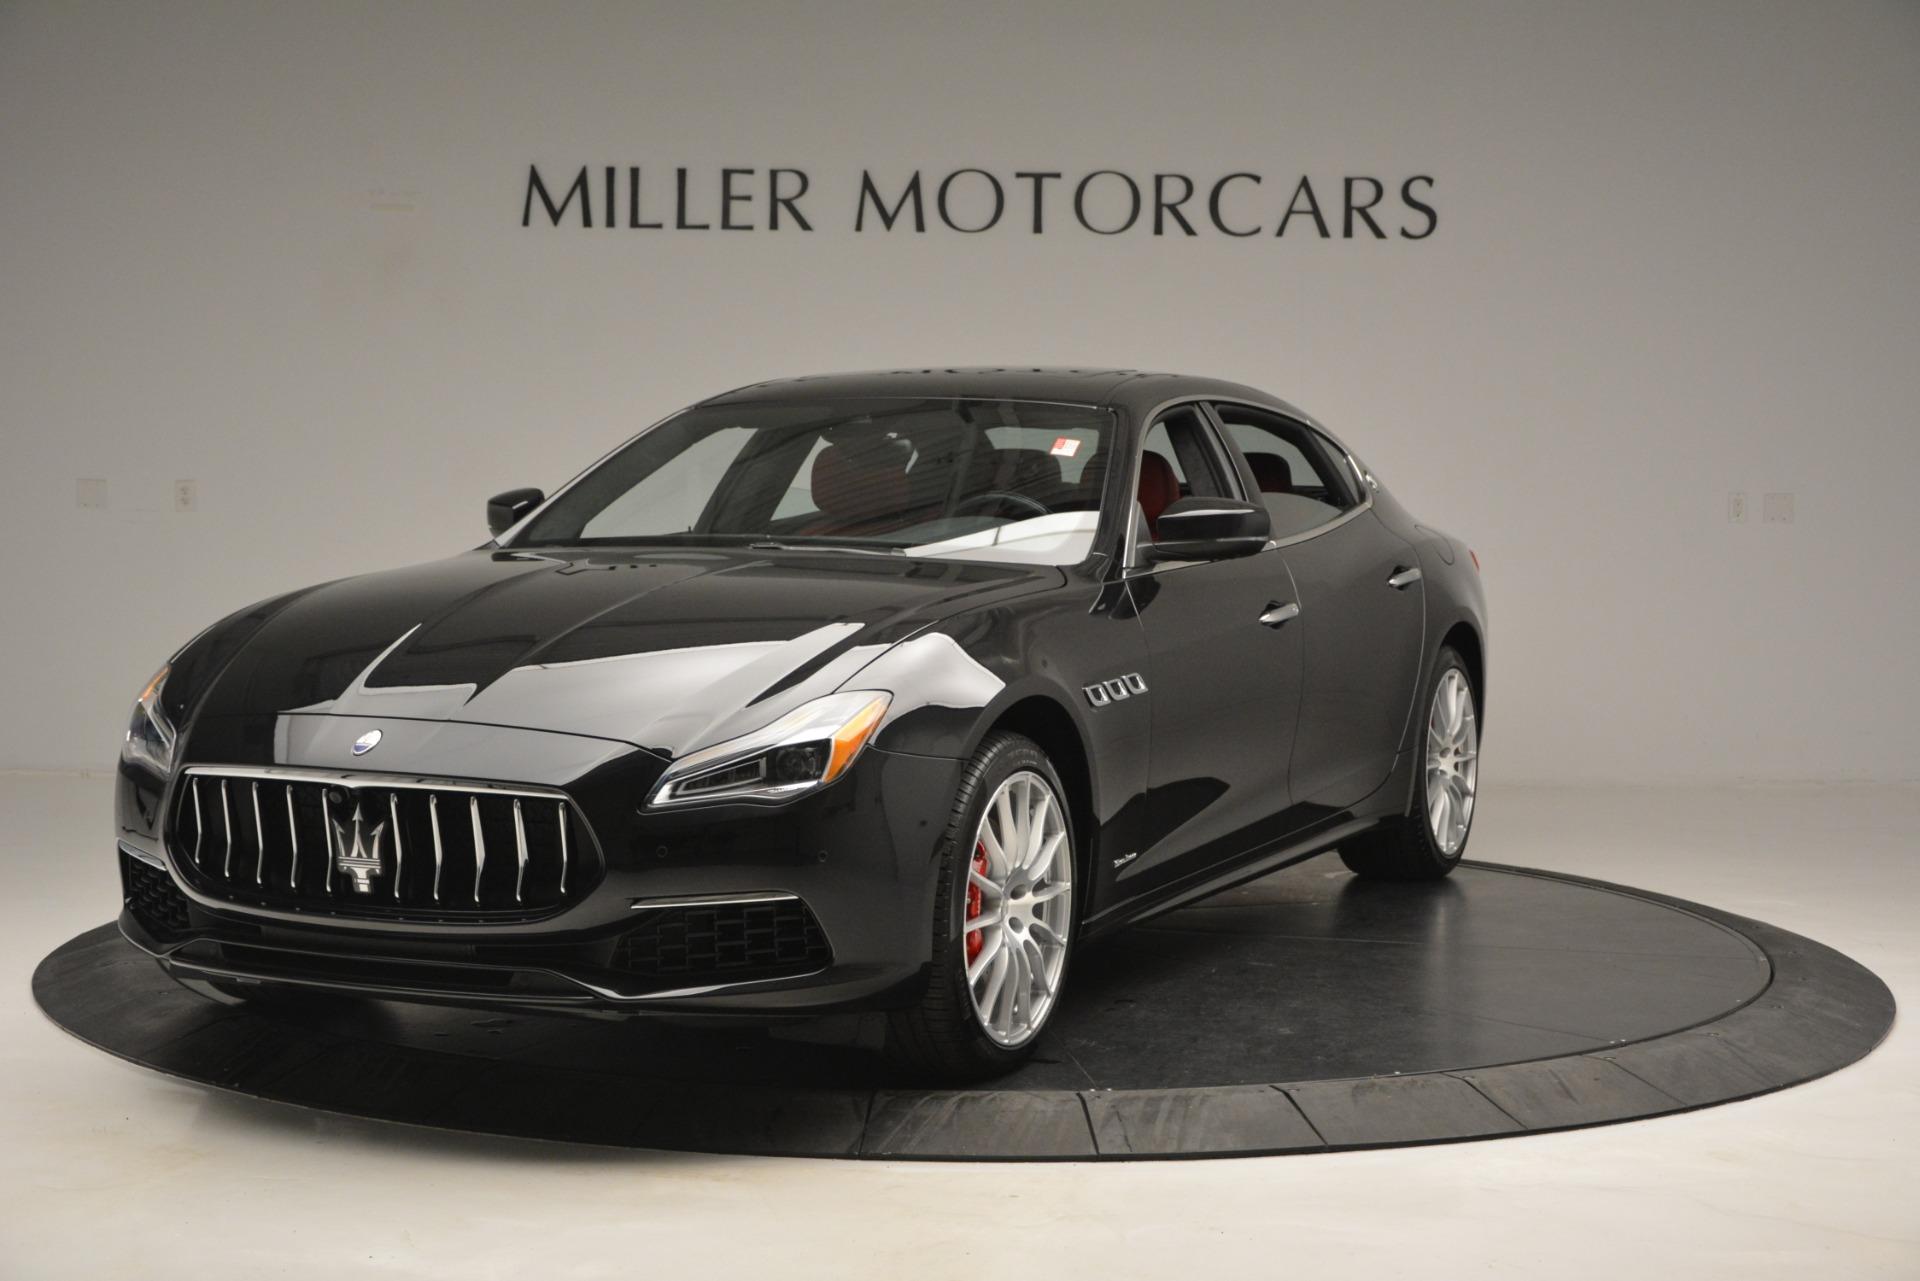 New 2019 Maserati Quattroporte S Q4 GranLusso For Sale In Westport, CT 2718_main